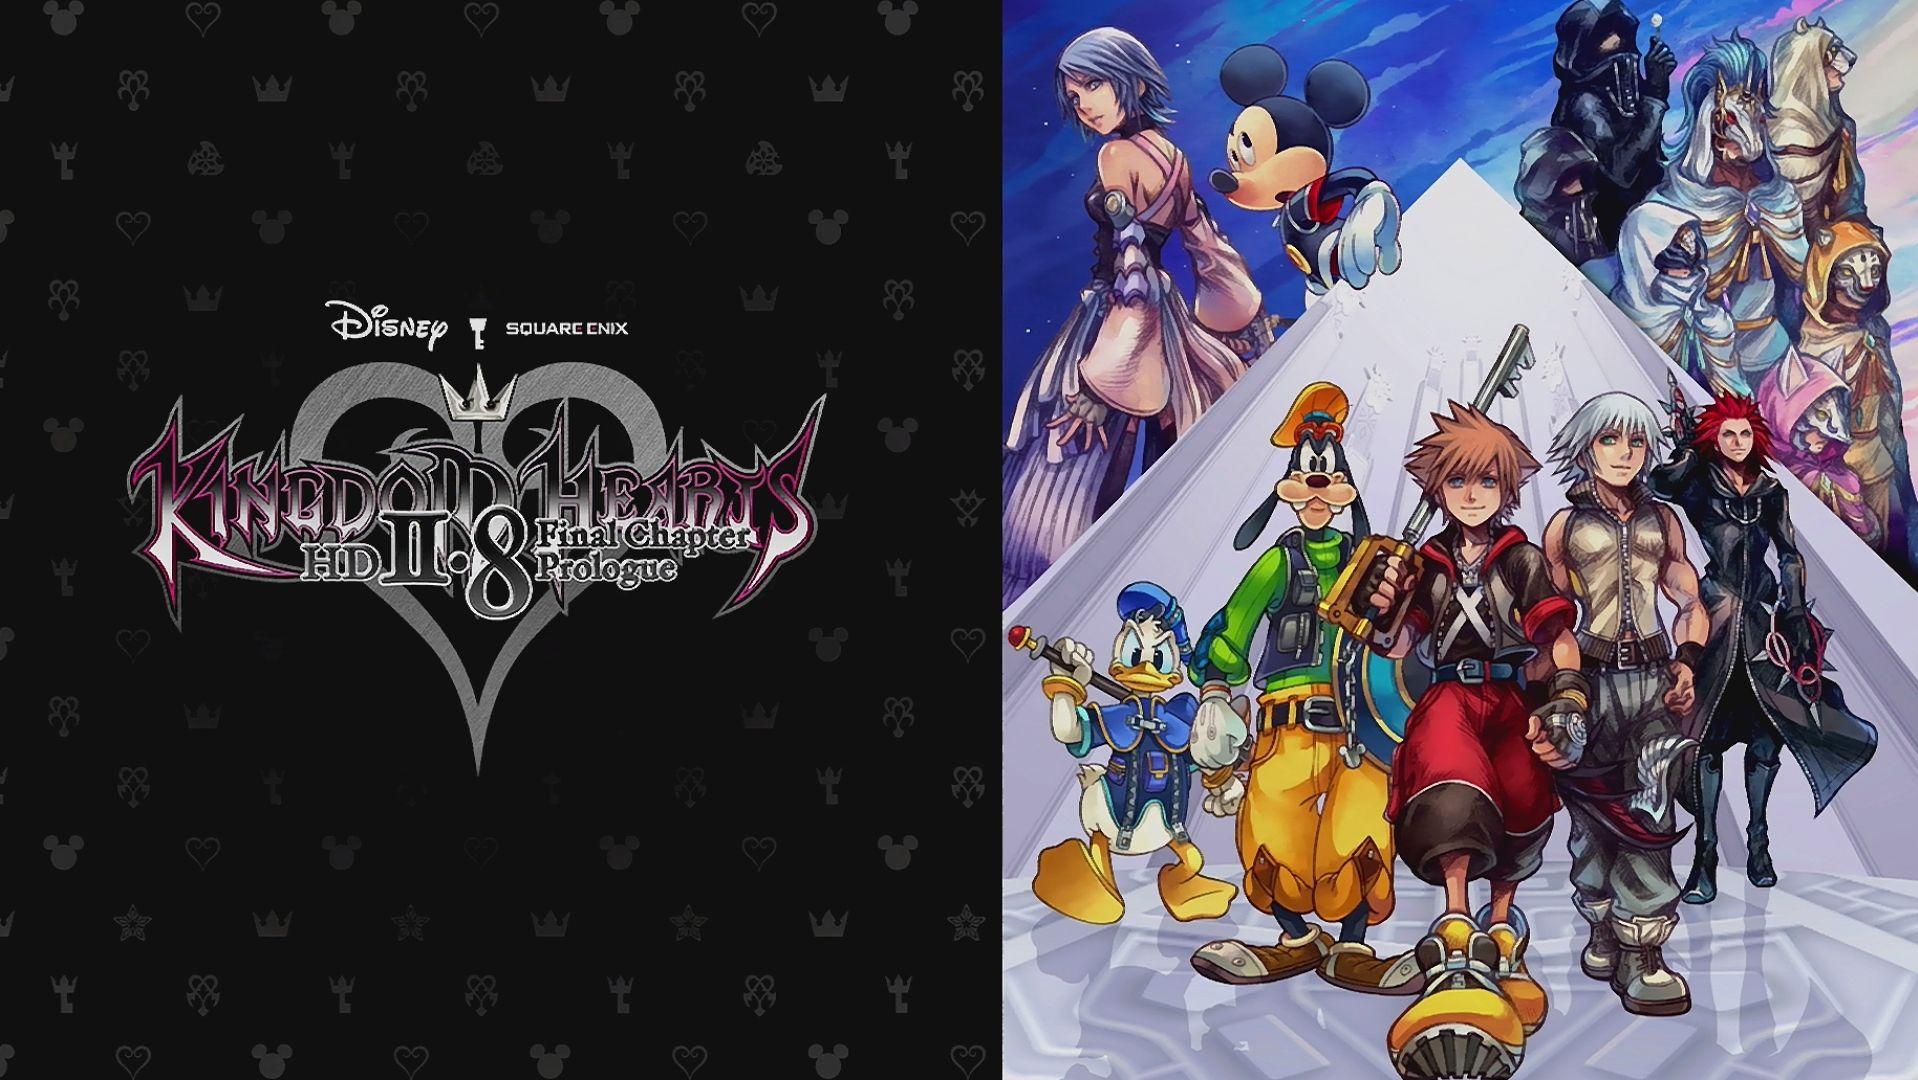 Kingdom Hearts II.8 HD Final Chapter Prologue